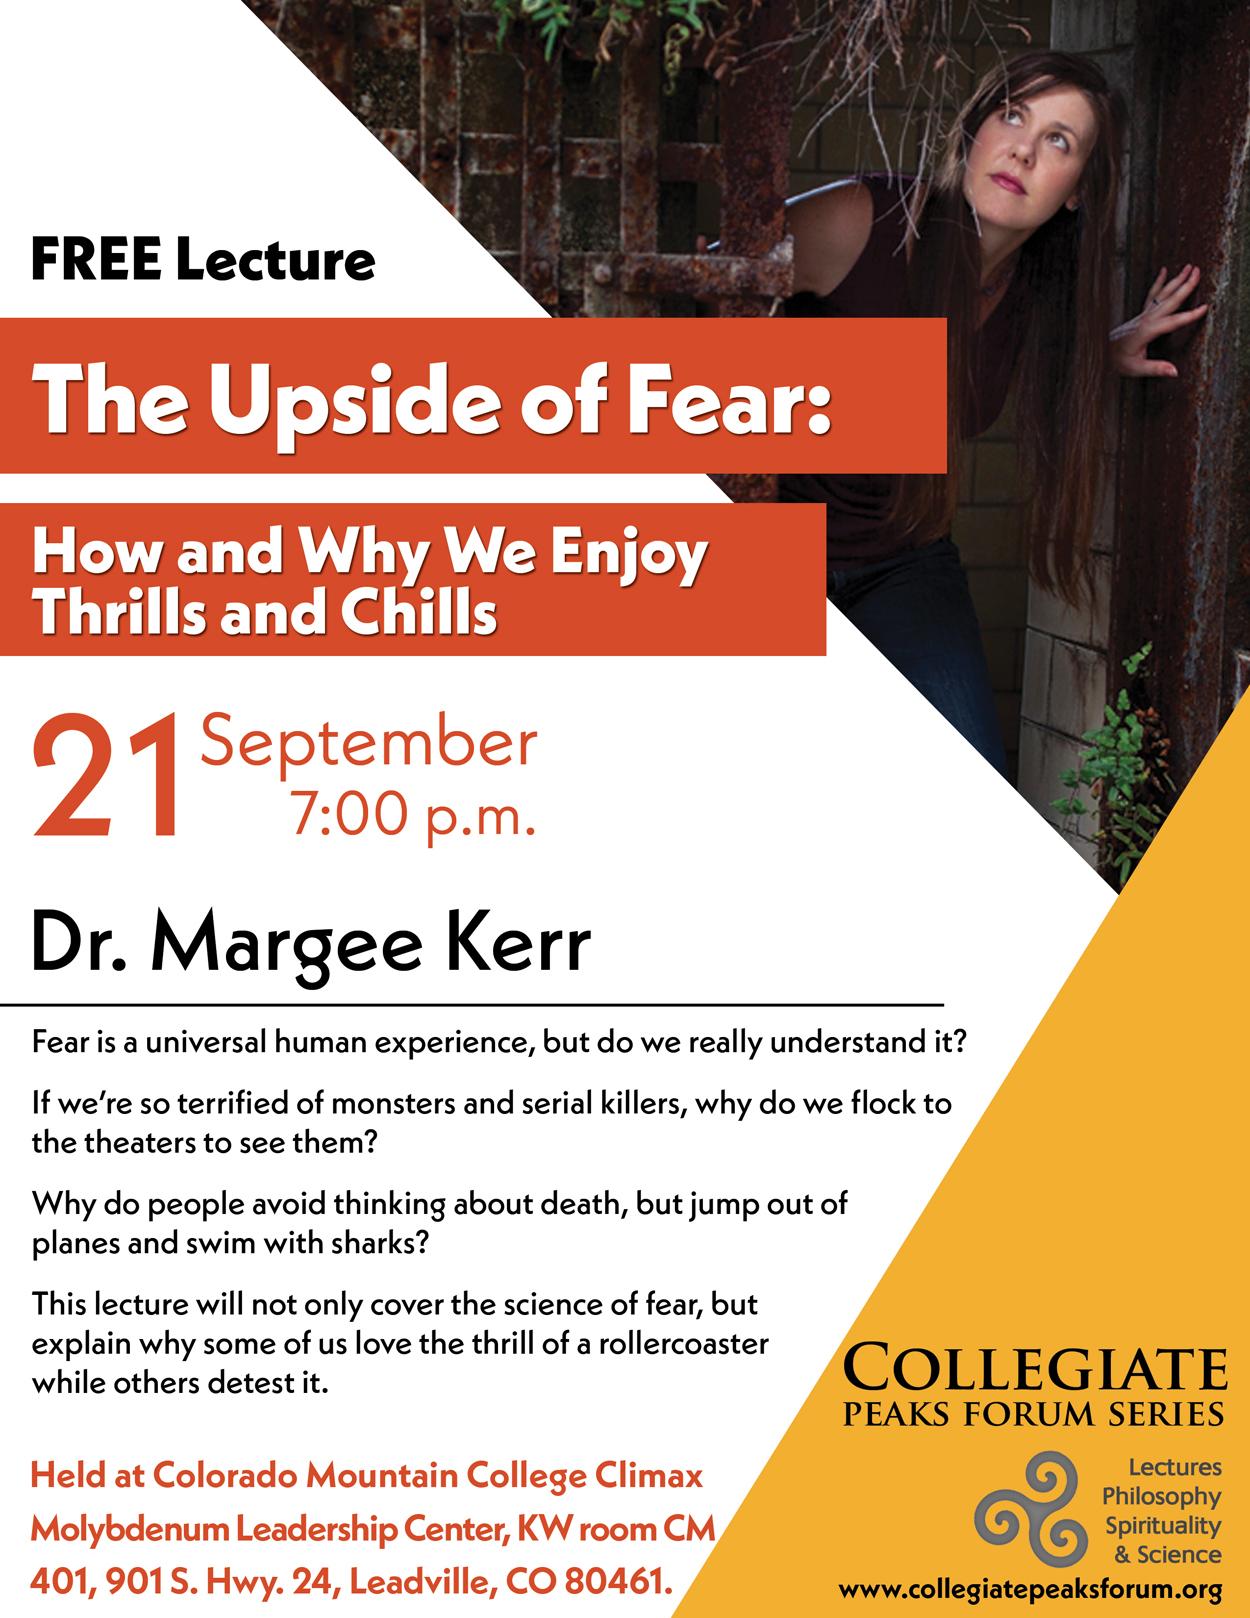 Sept. 21, 2017 Dr. Margee Kerr